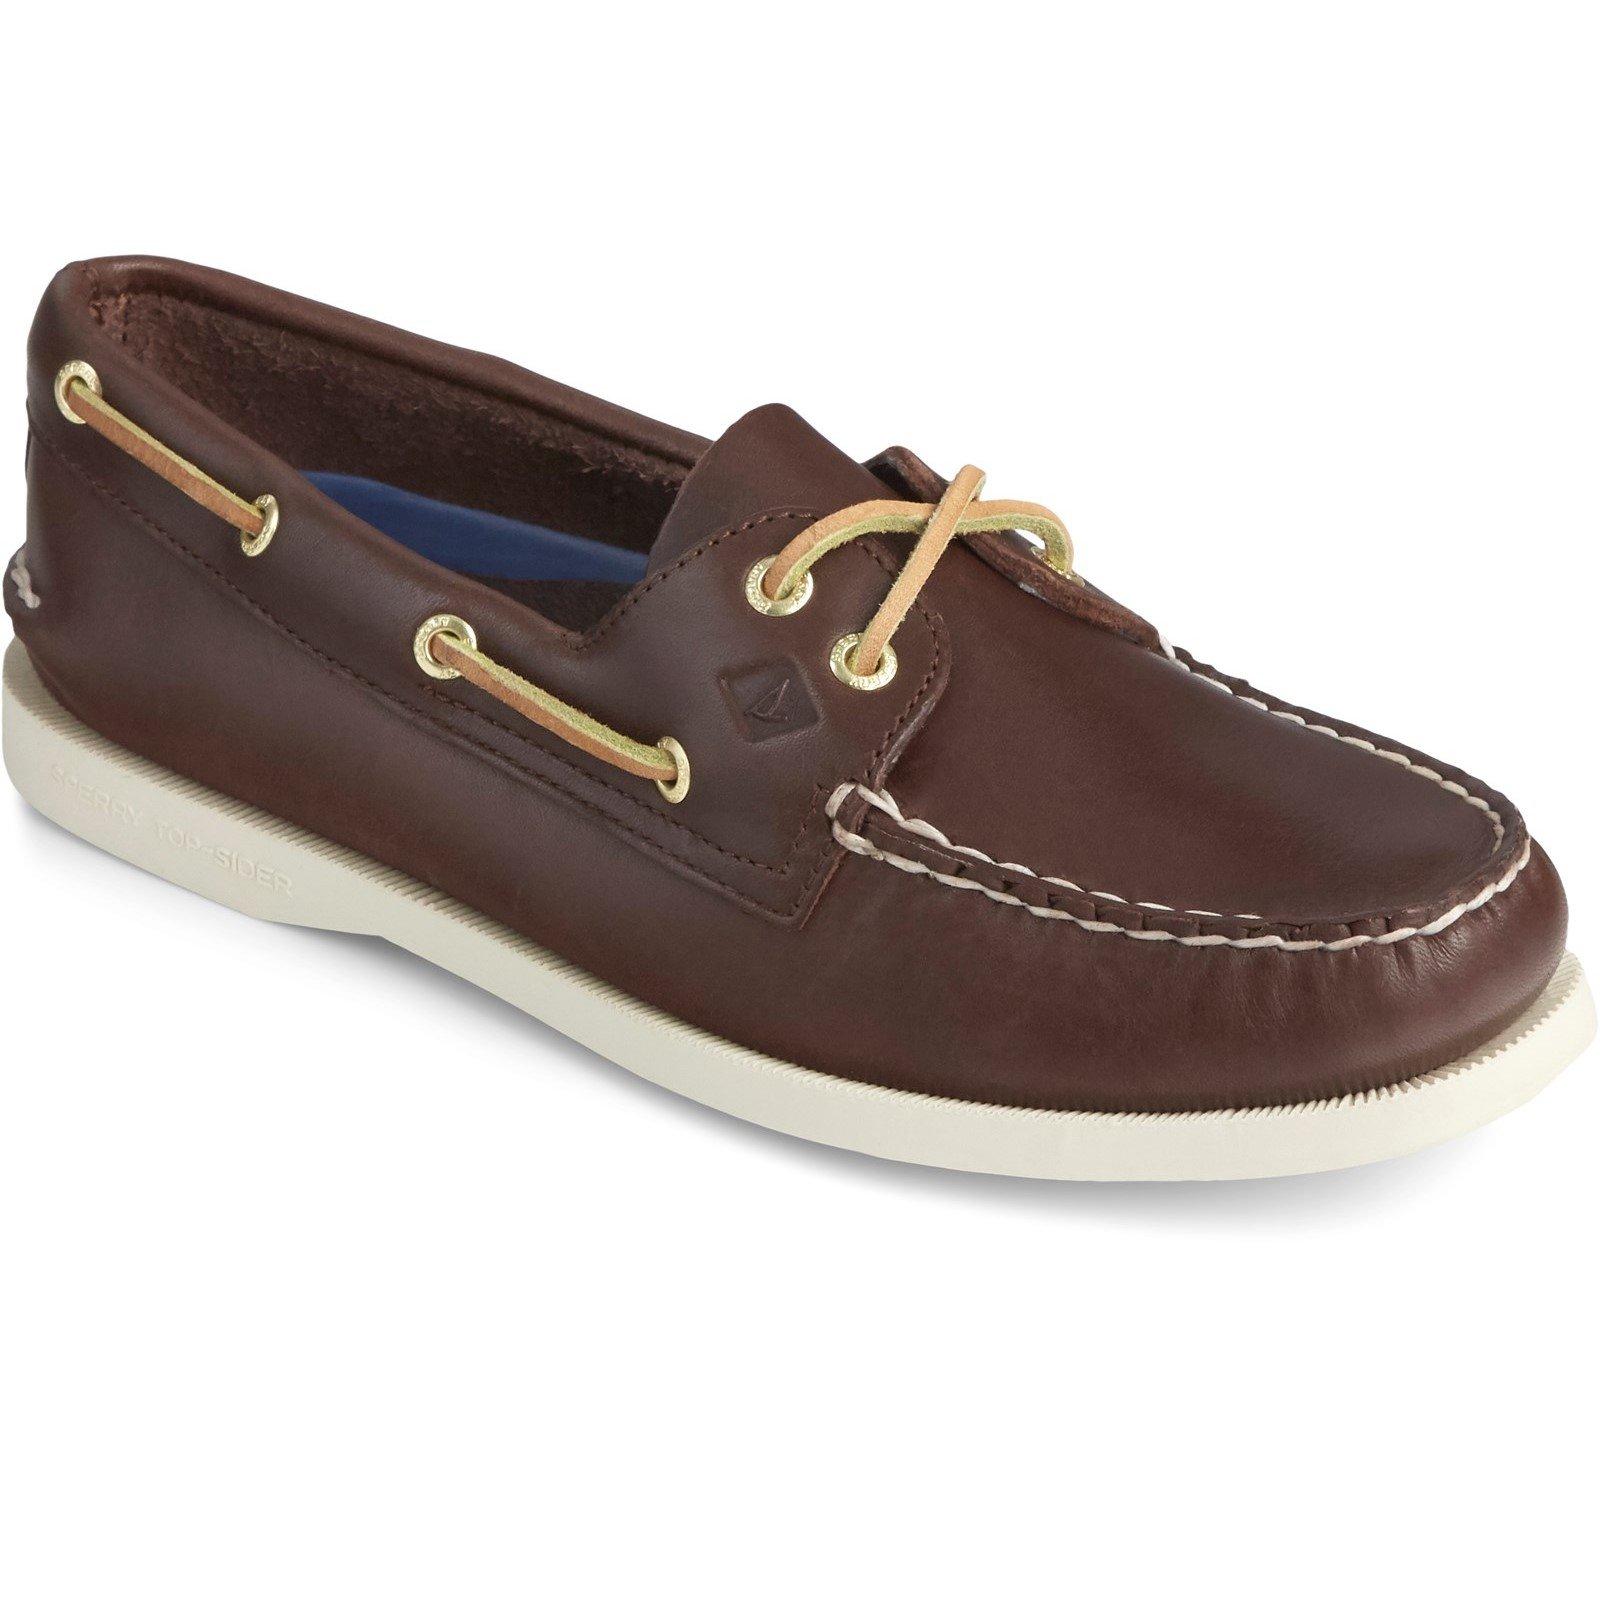 Sperry Women's Authentic Original Boat Shoe Various Colours 31535 - Brown 7